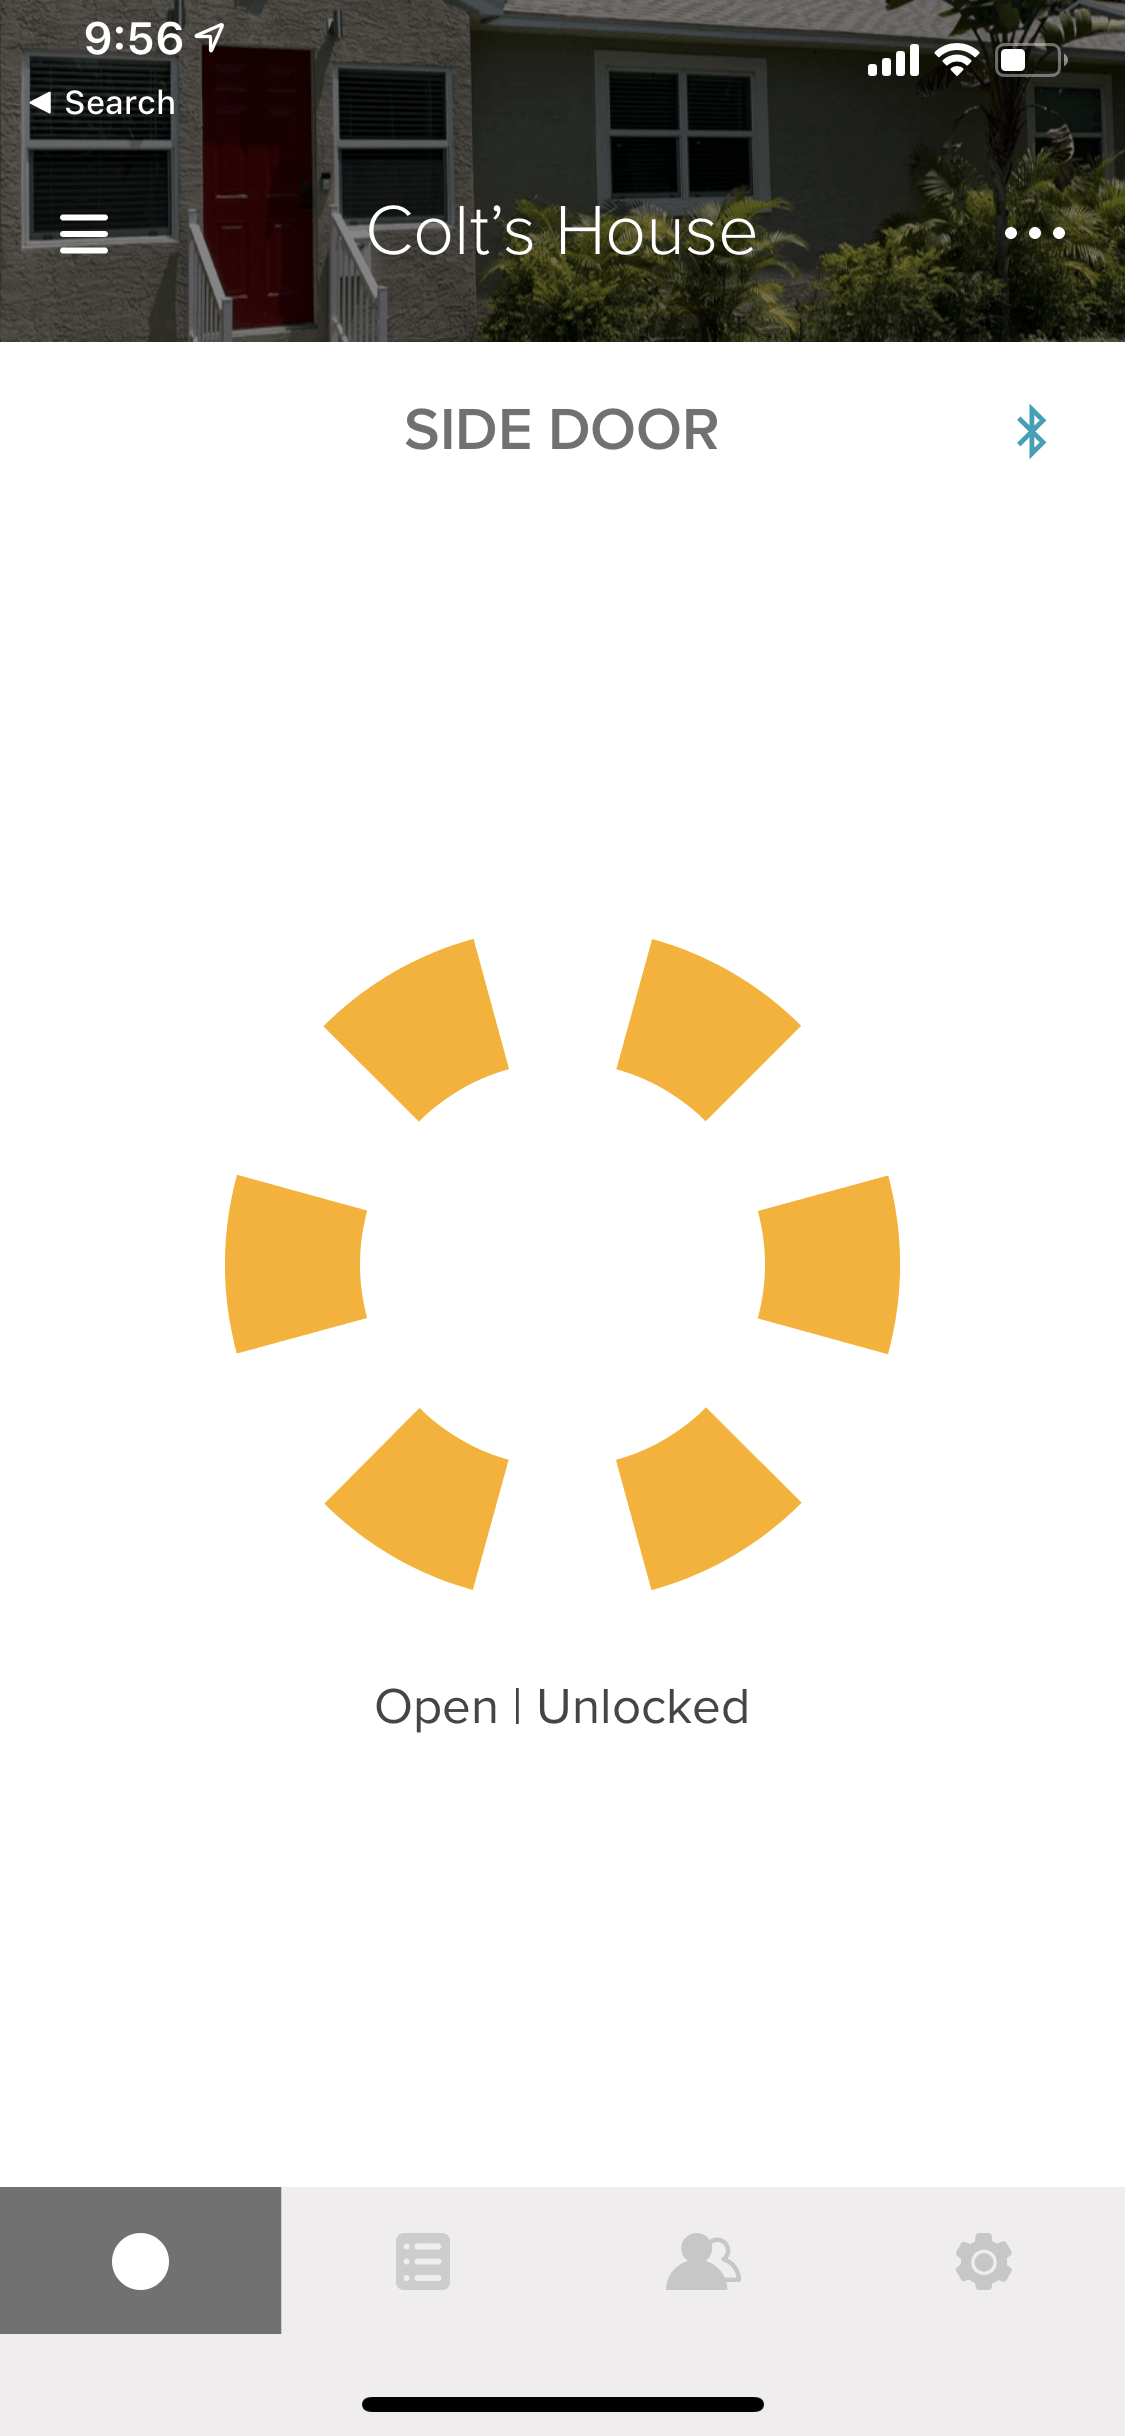 August Lock Status Opened